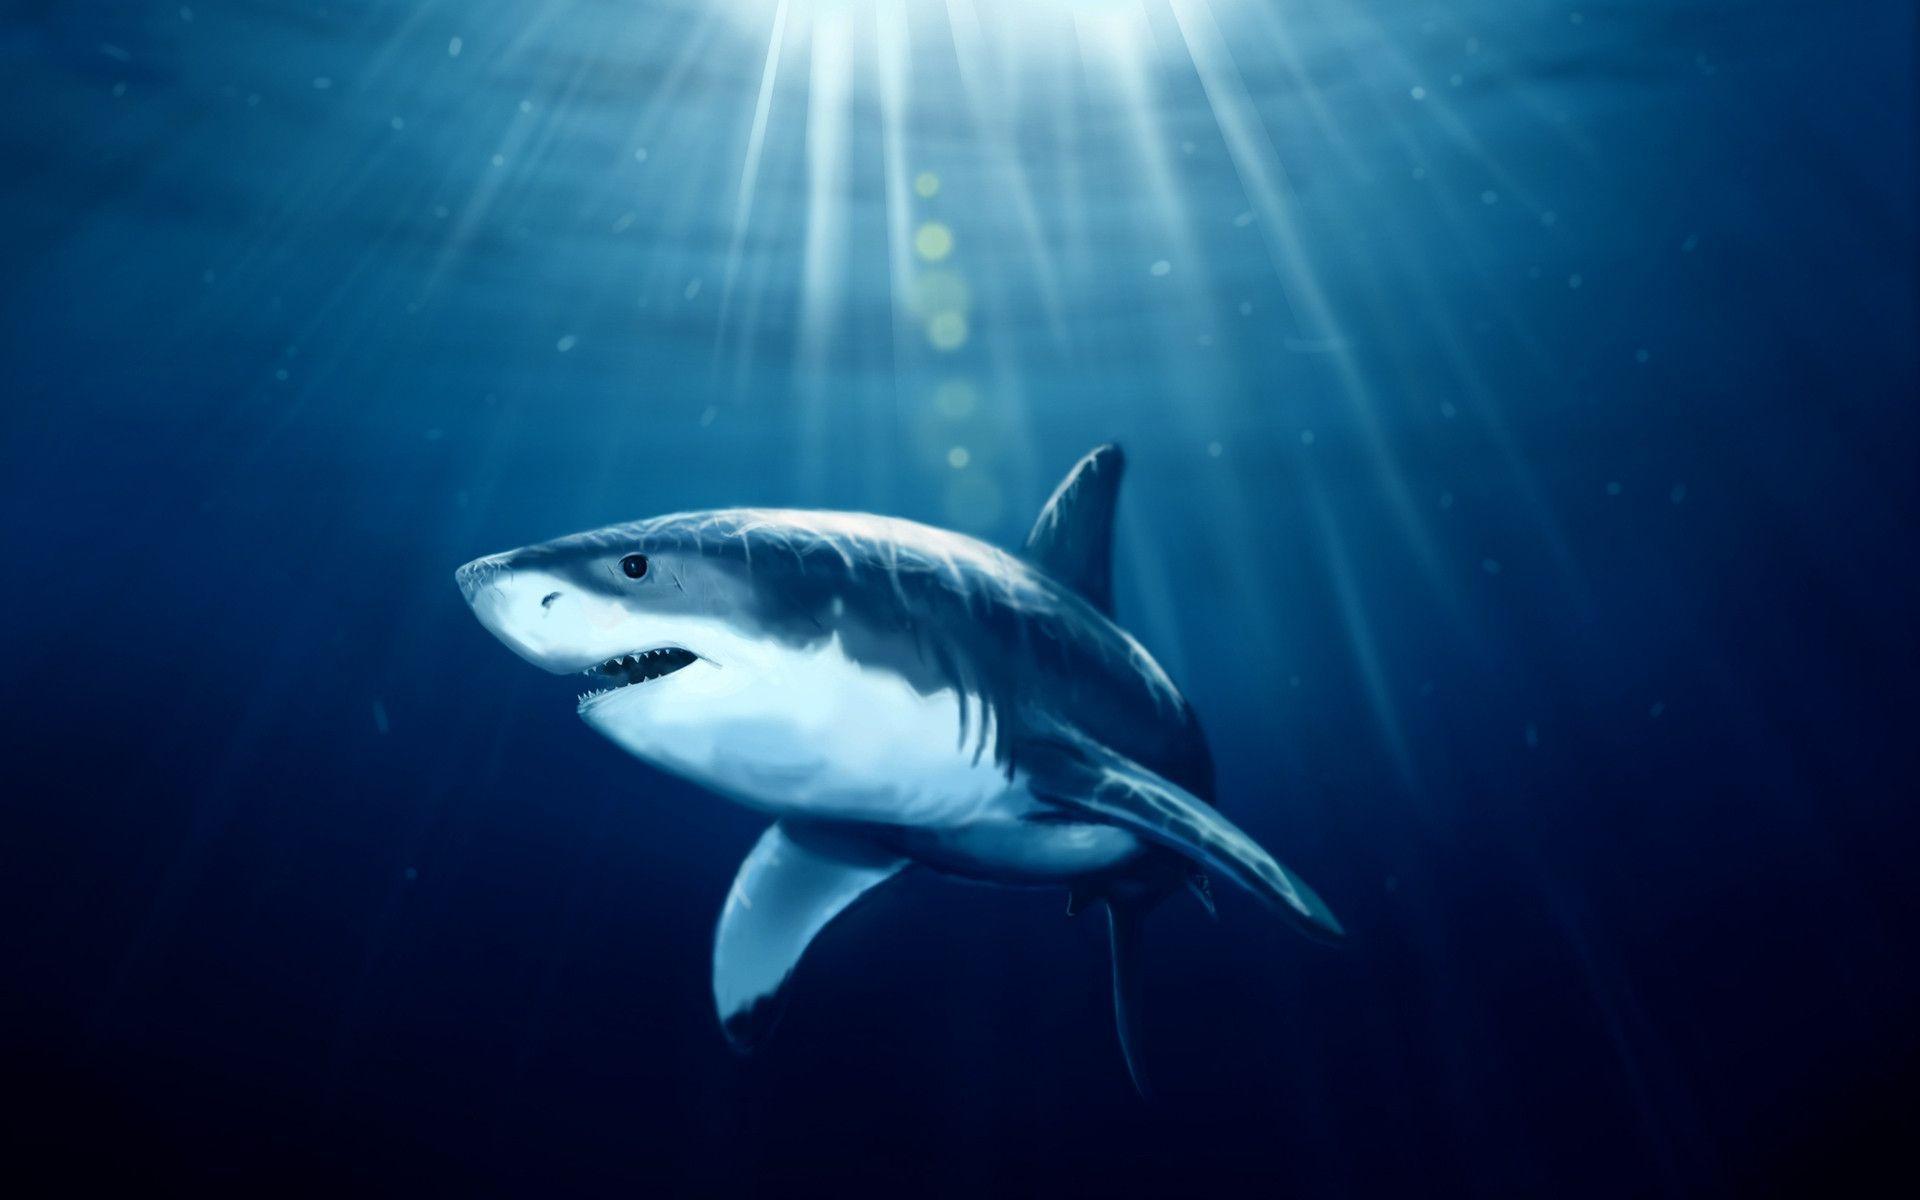 Shark Wallpaper – A Unique Wallpaper That Adds Life To Your Desktop